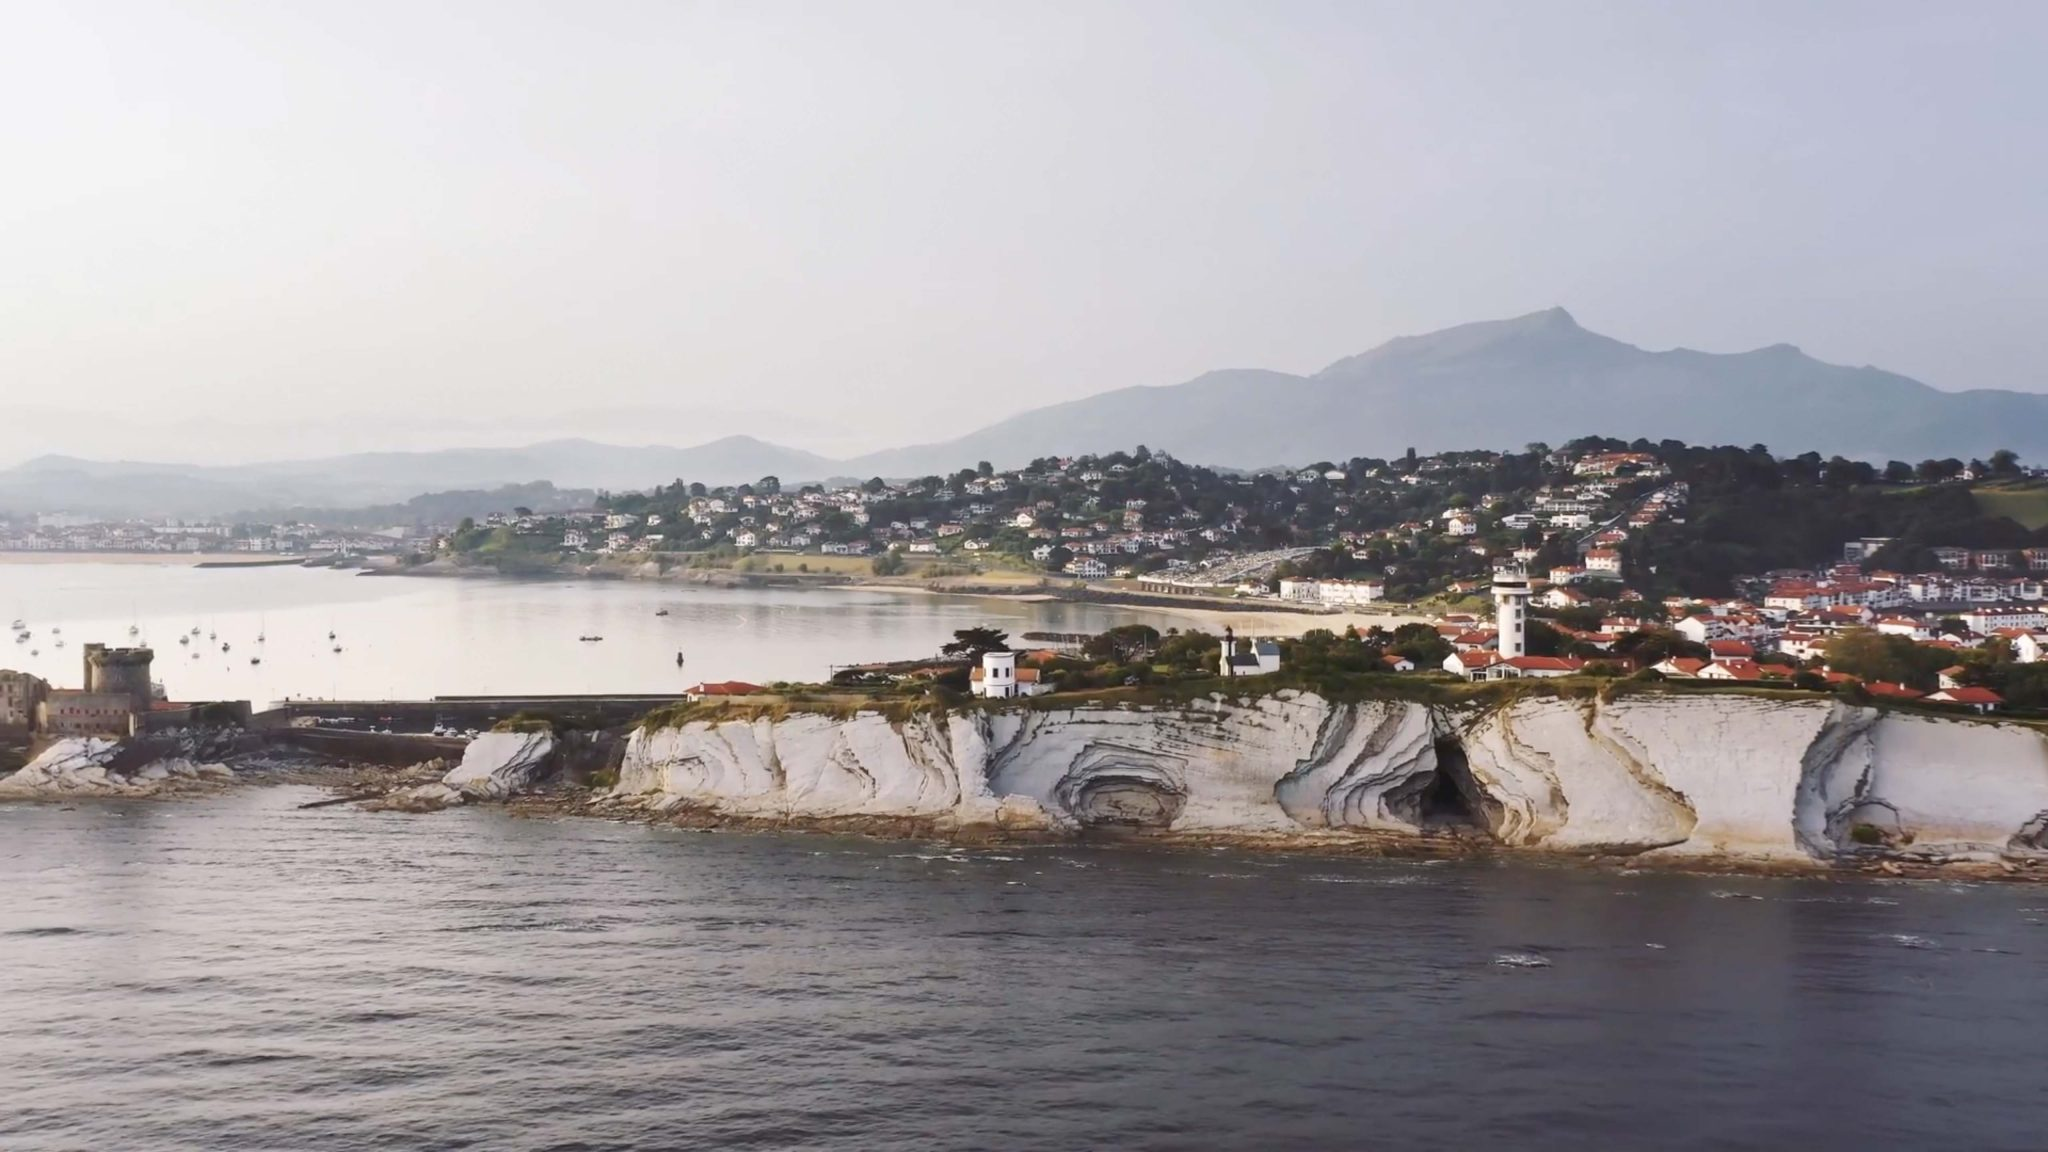 drone-ocean-mringalss-films-pierre-frechou-bayonne-anglet-biarritz